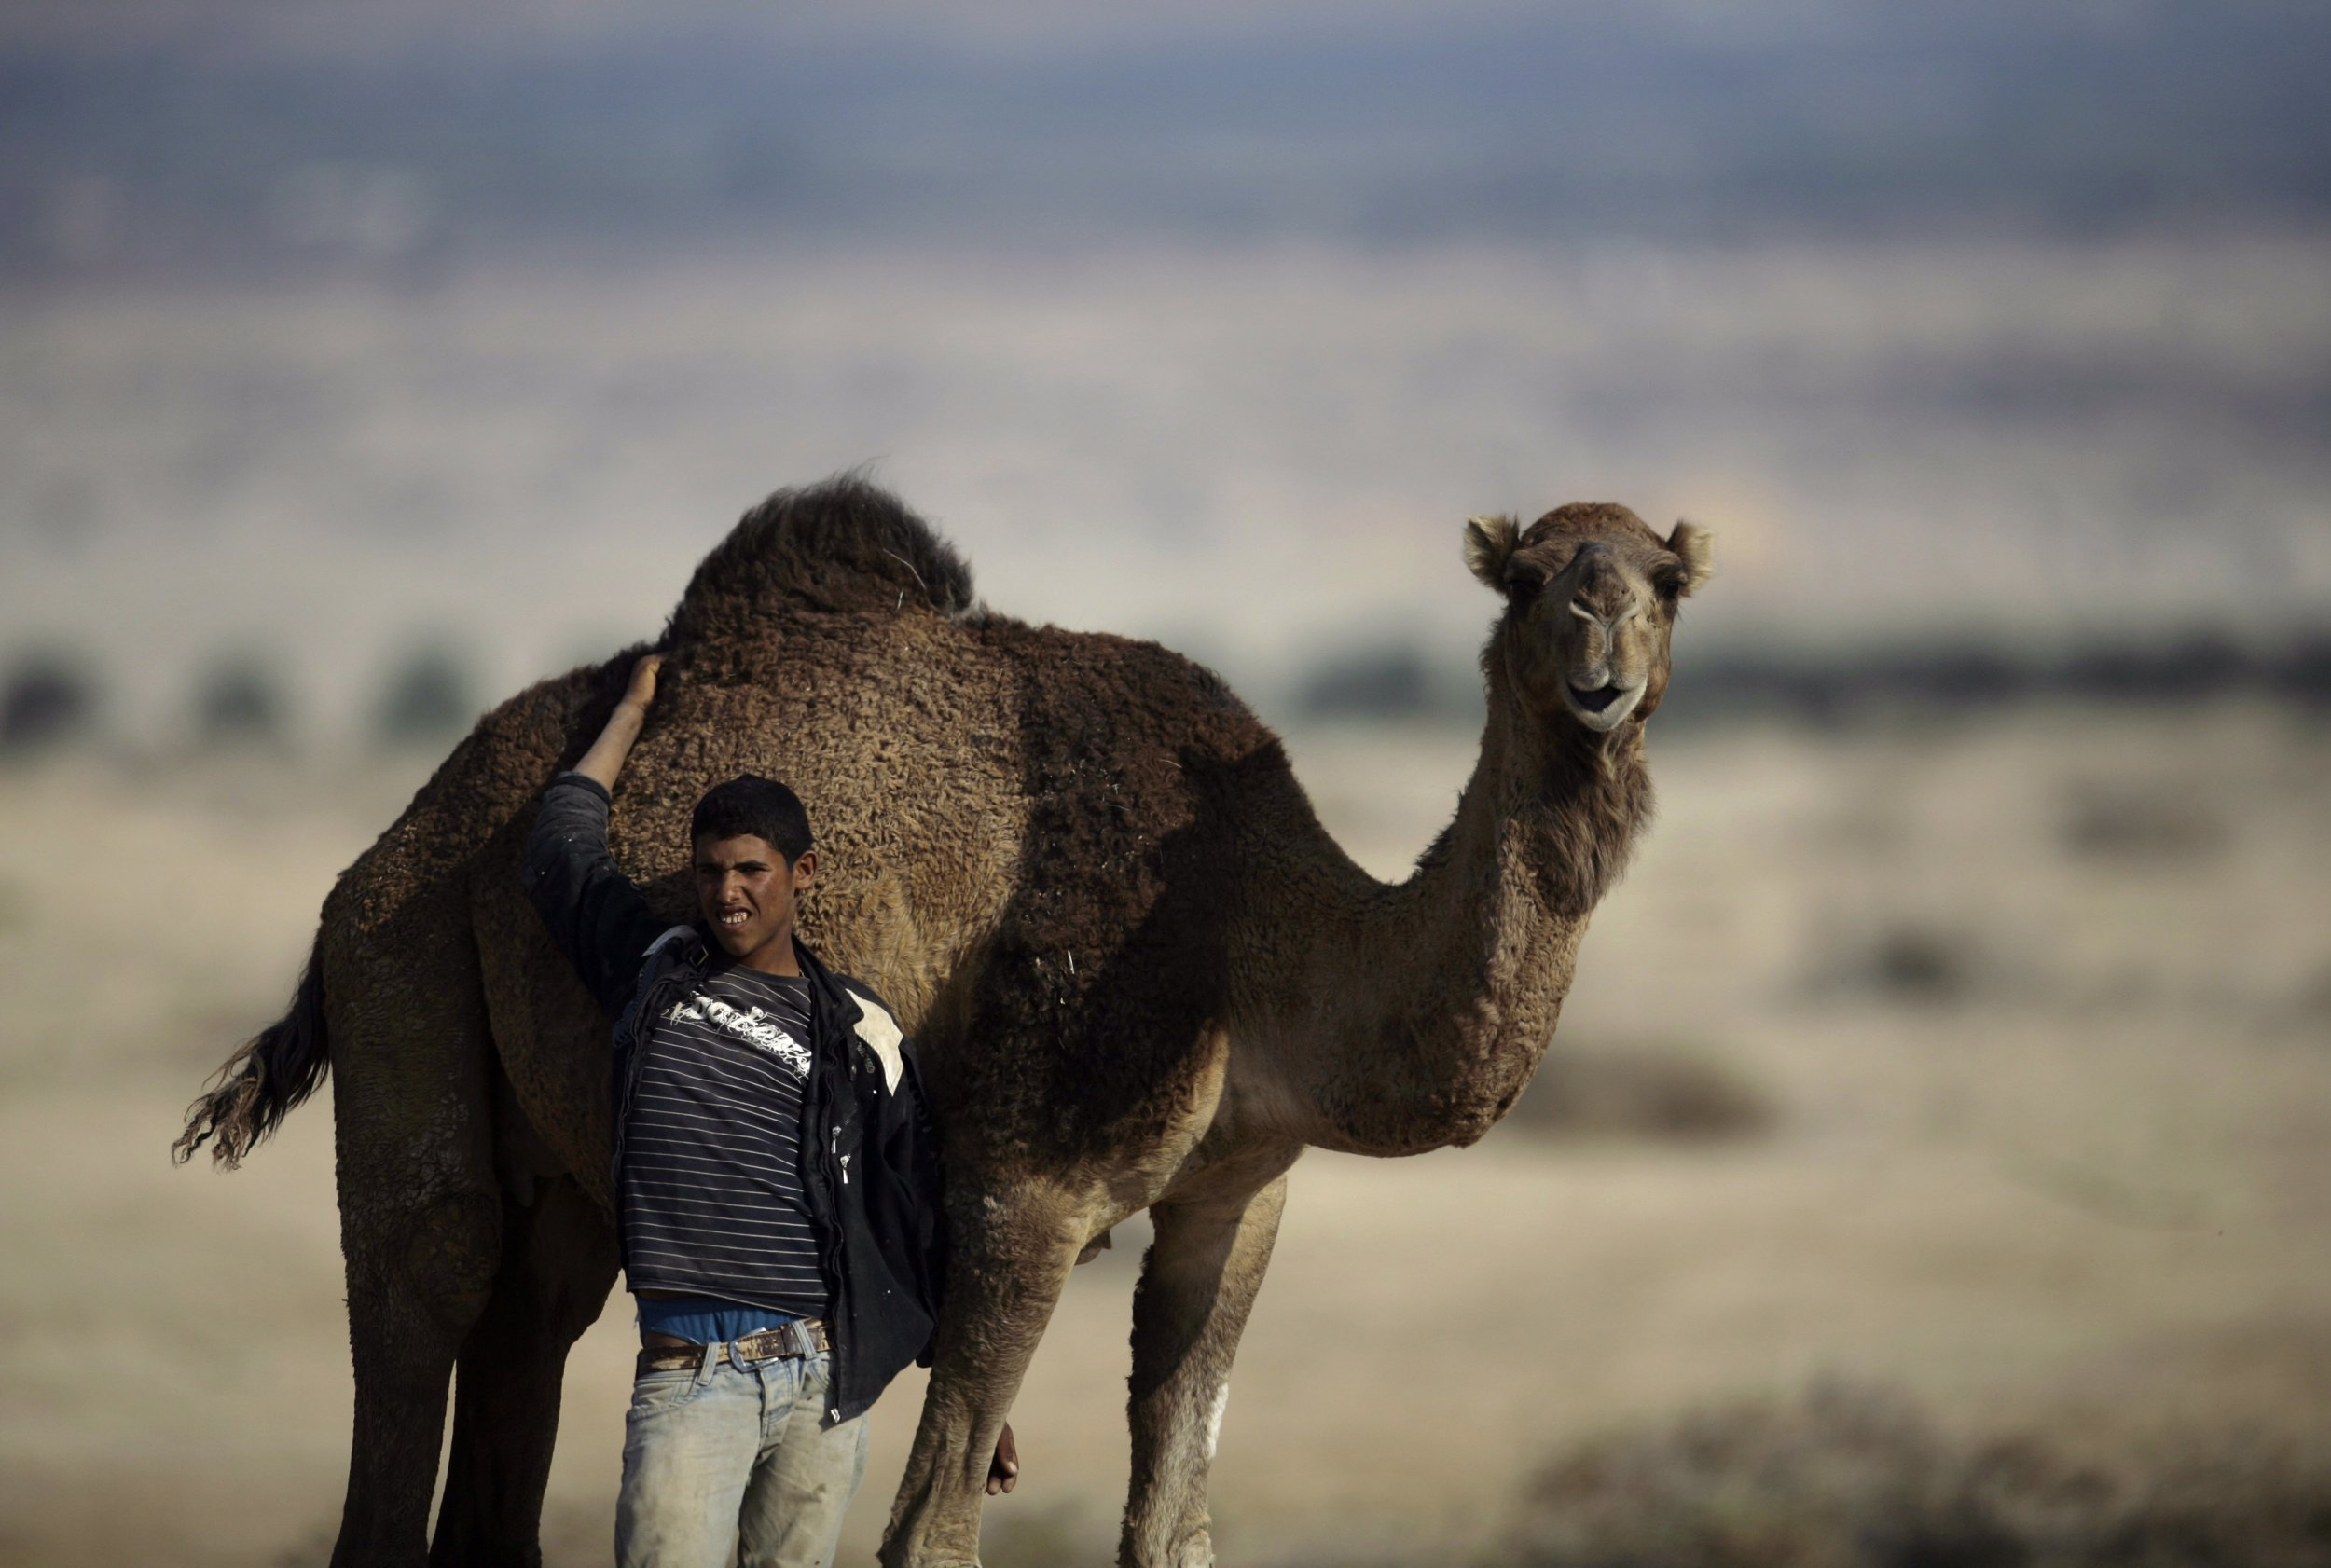 0127_Israel_Camel_WestBank_01